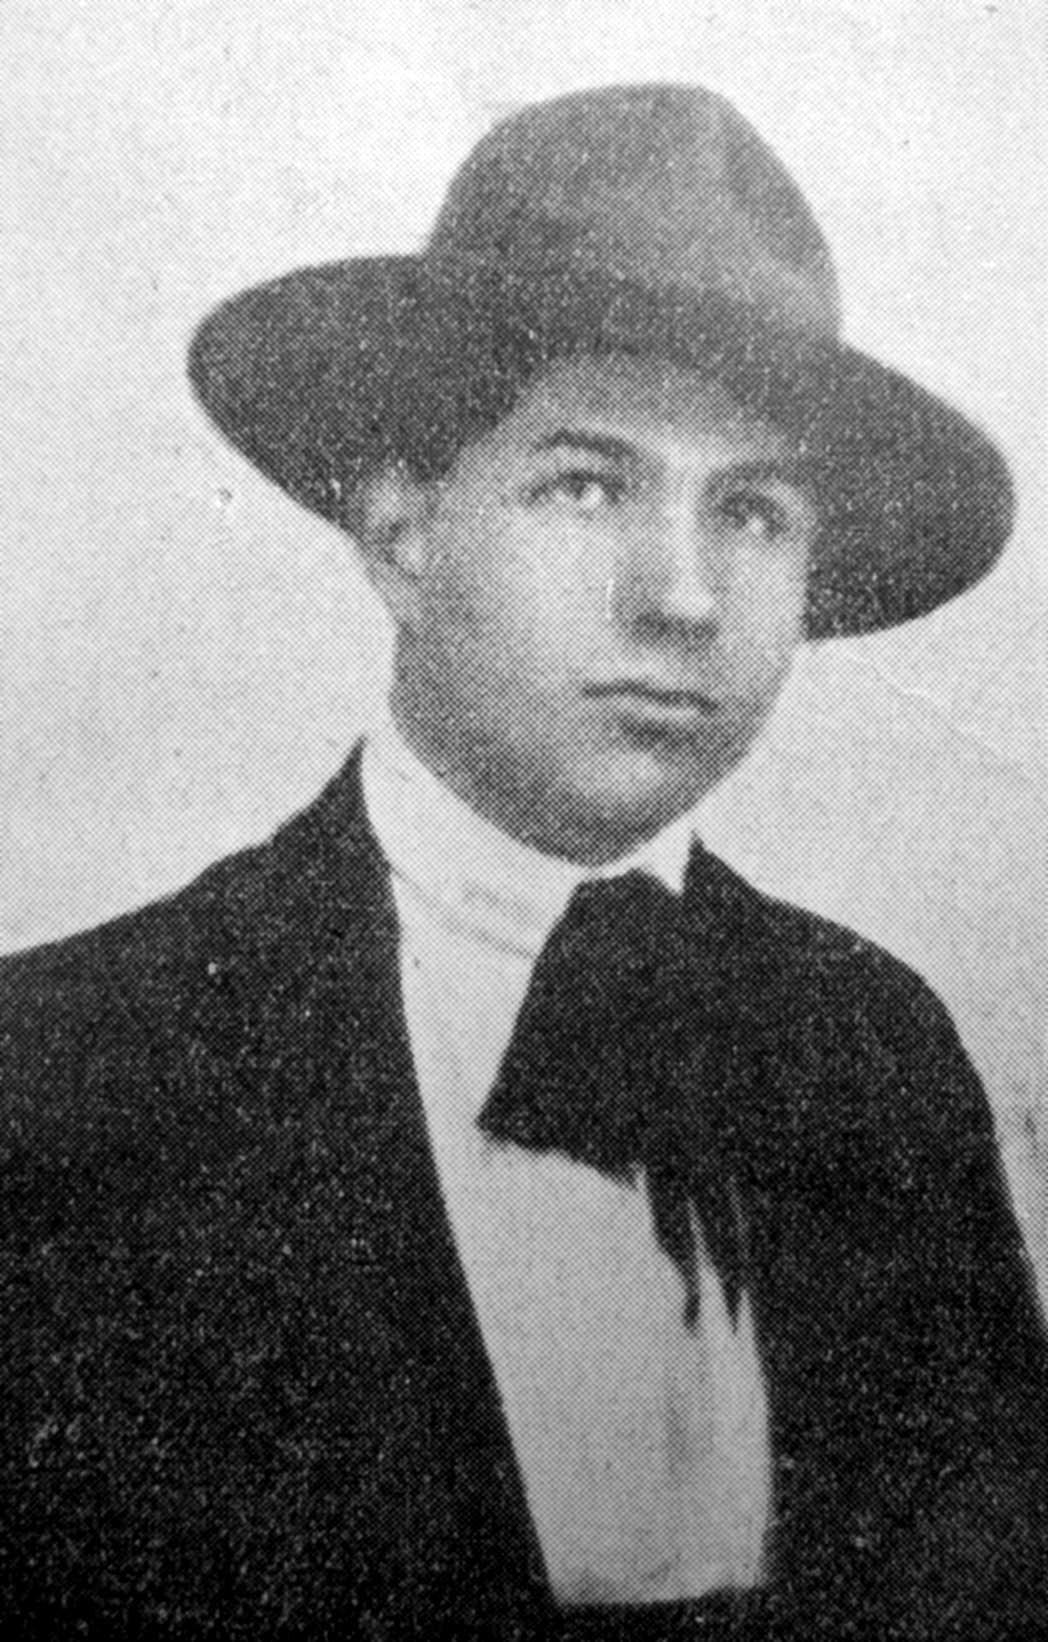 Bruno Filippi